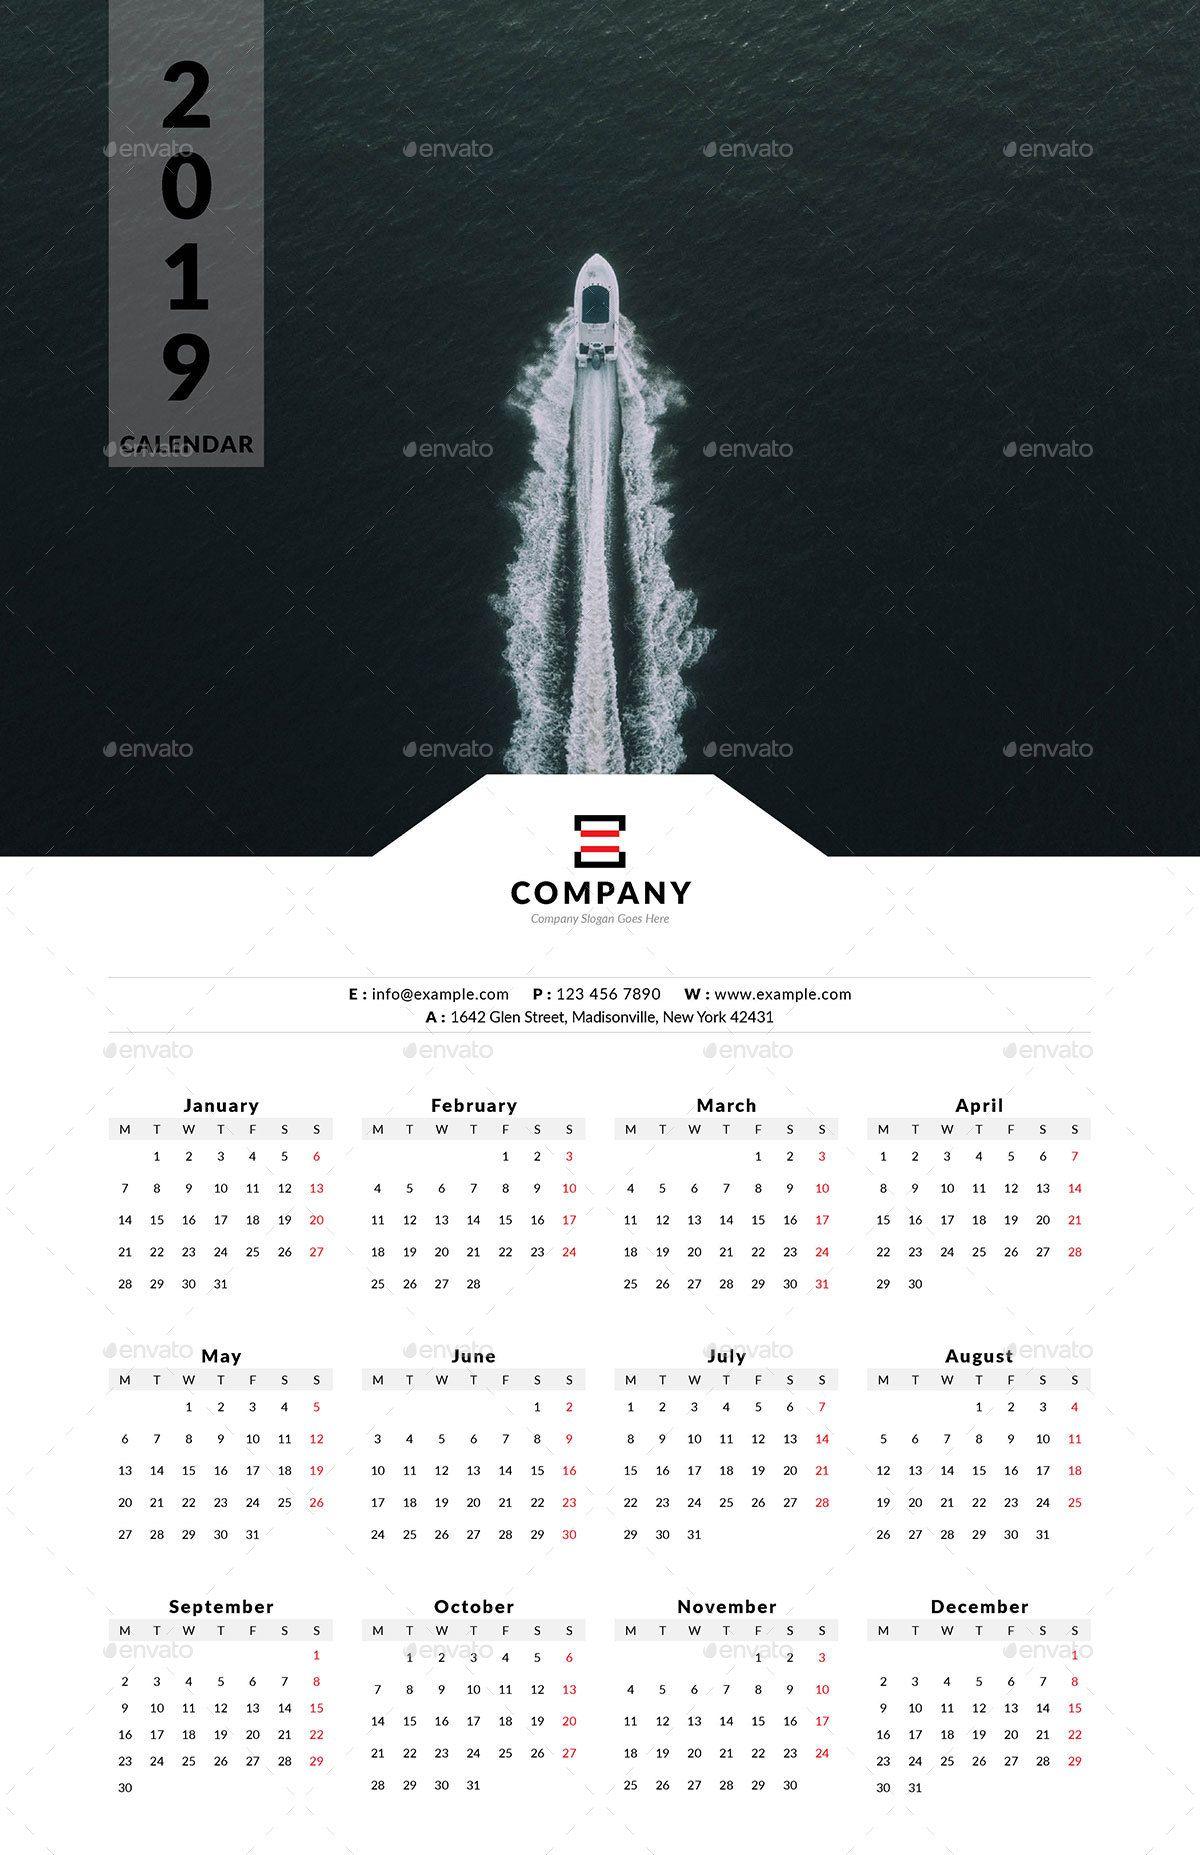 2019 One Page Wall Calendar Wall Calendar Calendar Wall Calendar Design